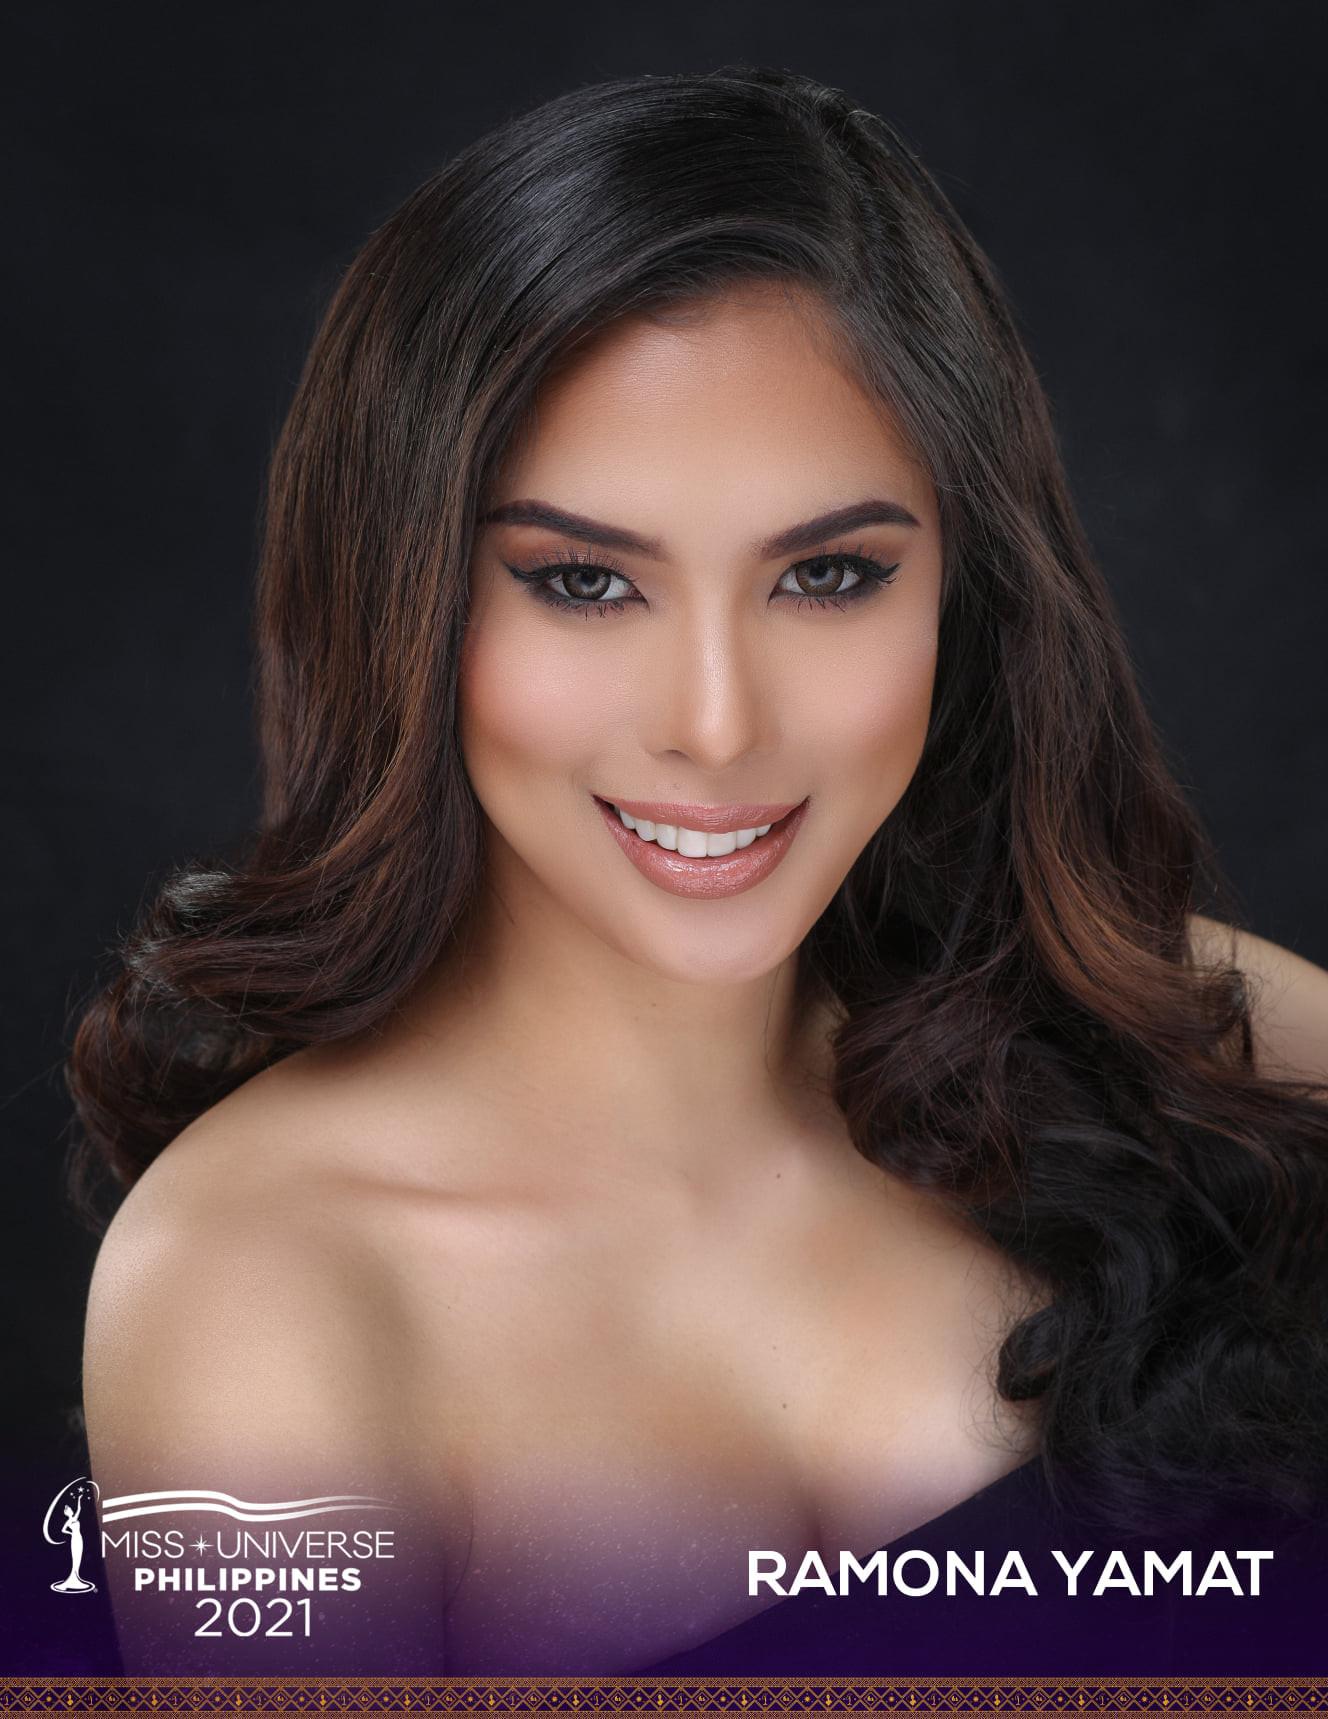 pre-candidatas a miss universe philippines 2021. - Página 5 AlYuCN